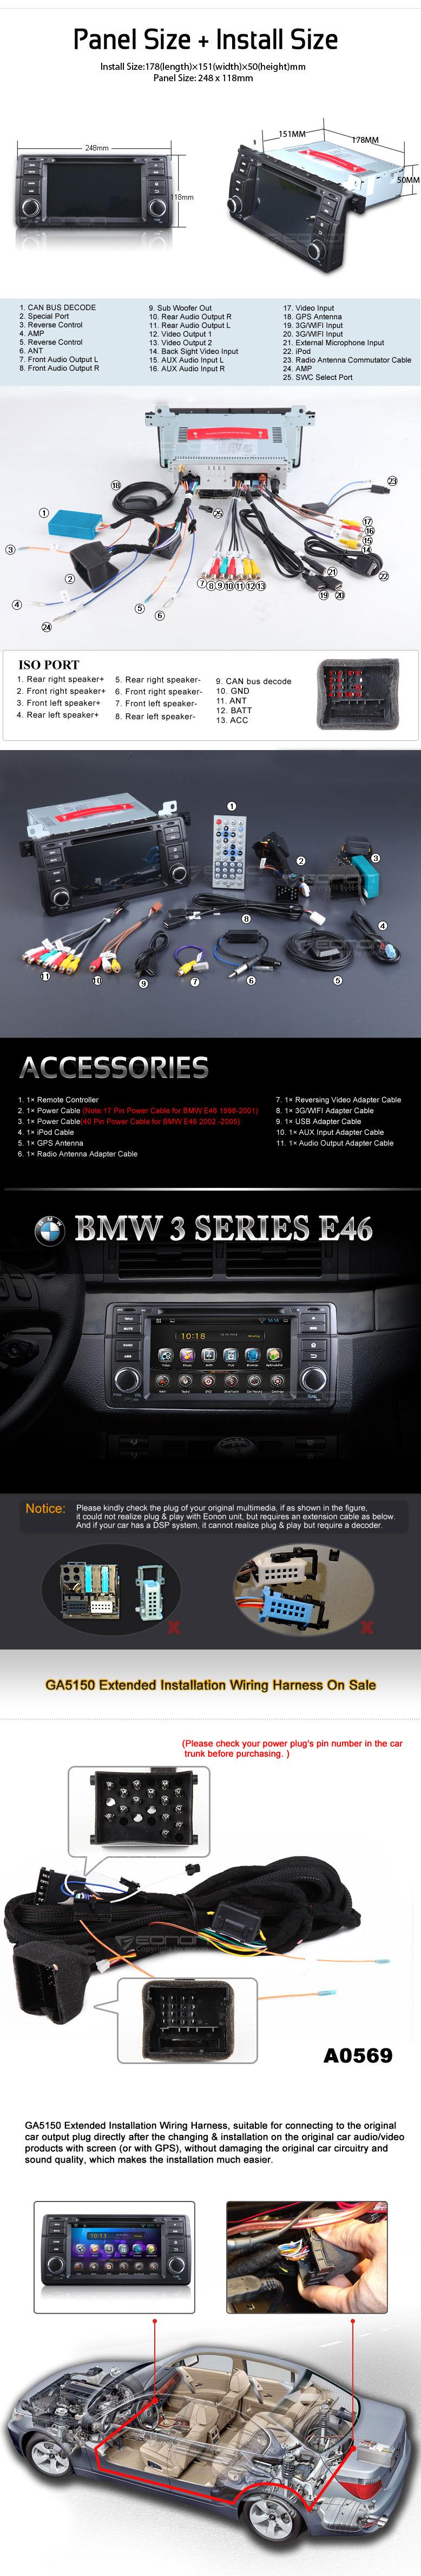 New Eonon Android Ga5150 Bmw Car Dvd Released Page 20 E46fanatics D5150 Wiring Diagram Http Eononcom Userfiles Image 06